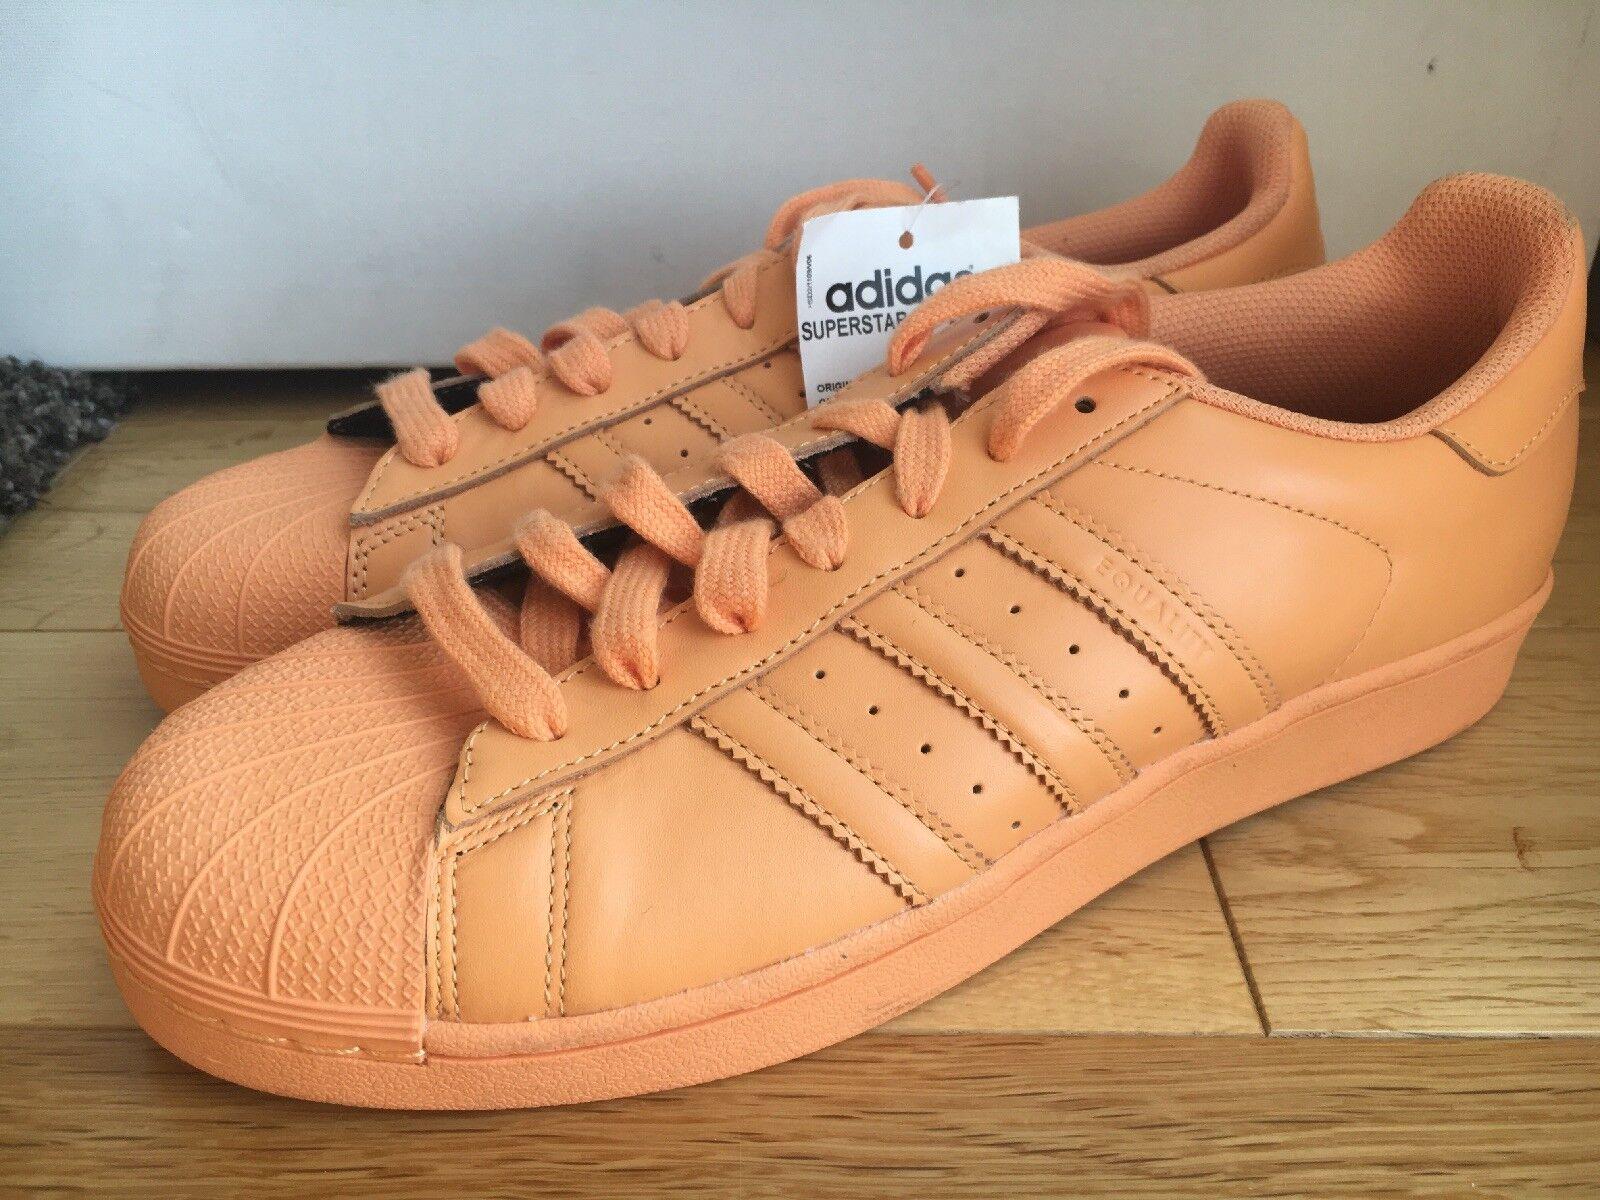 Adidas Superstar Pharrell Williams UK 9    Pride Light orange  color